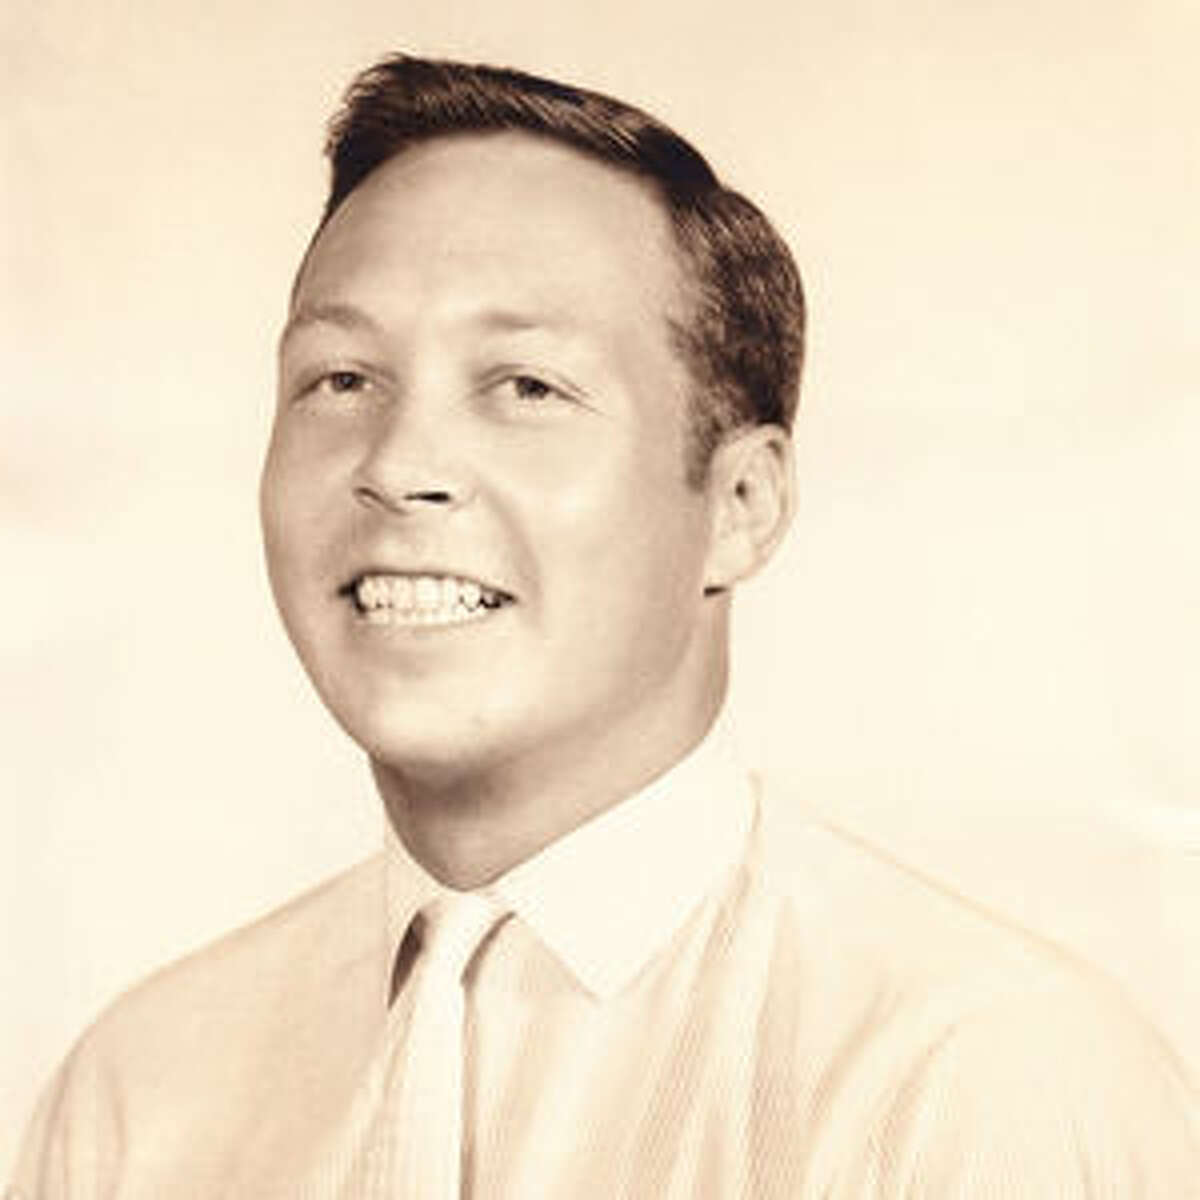 Wayne Sims died July 26. He was 74.